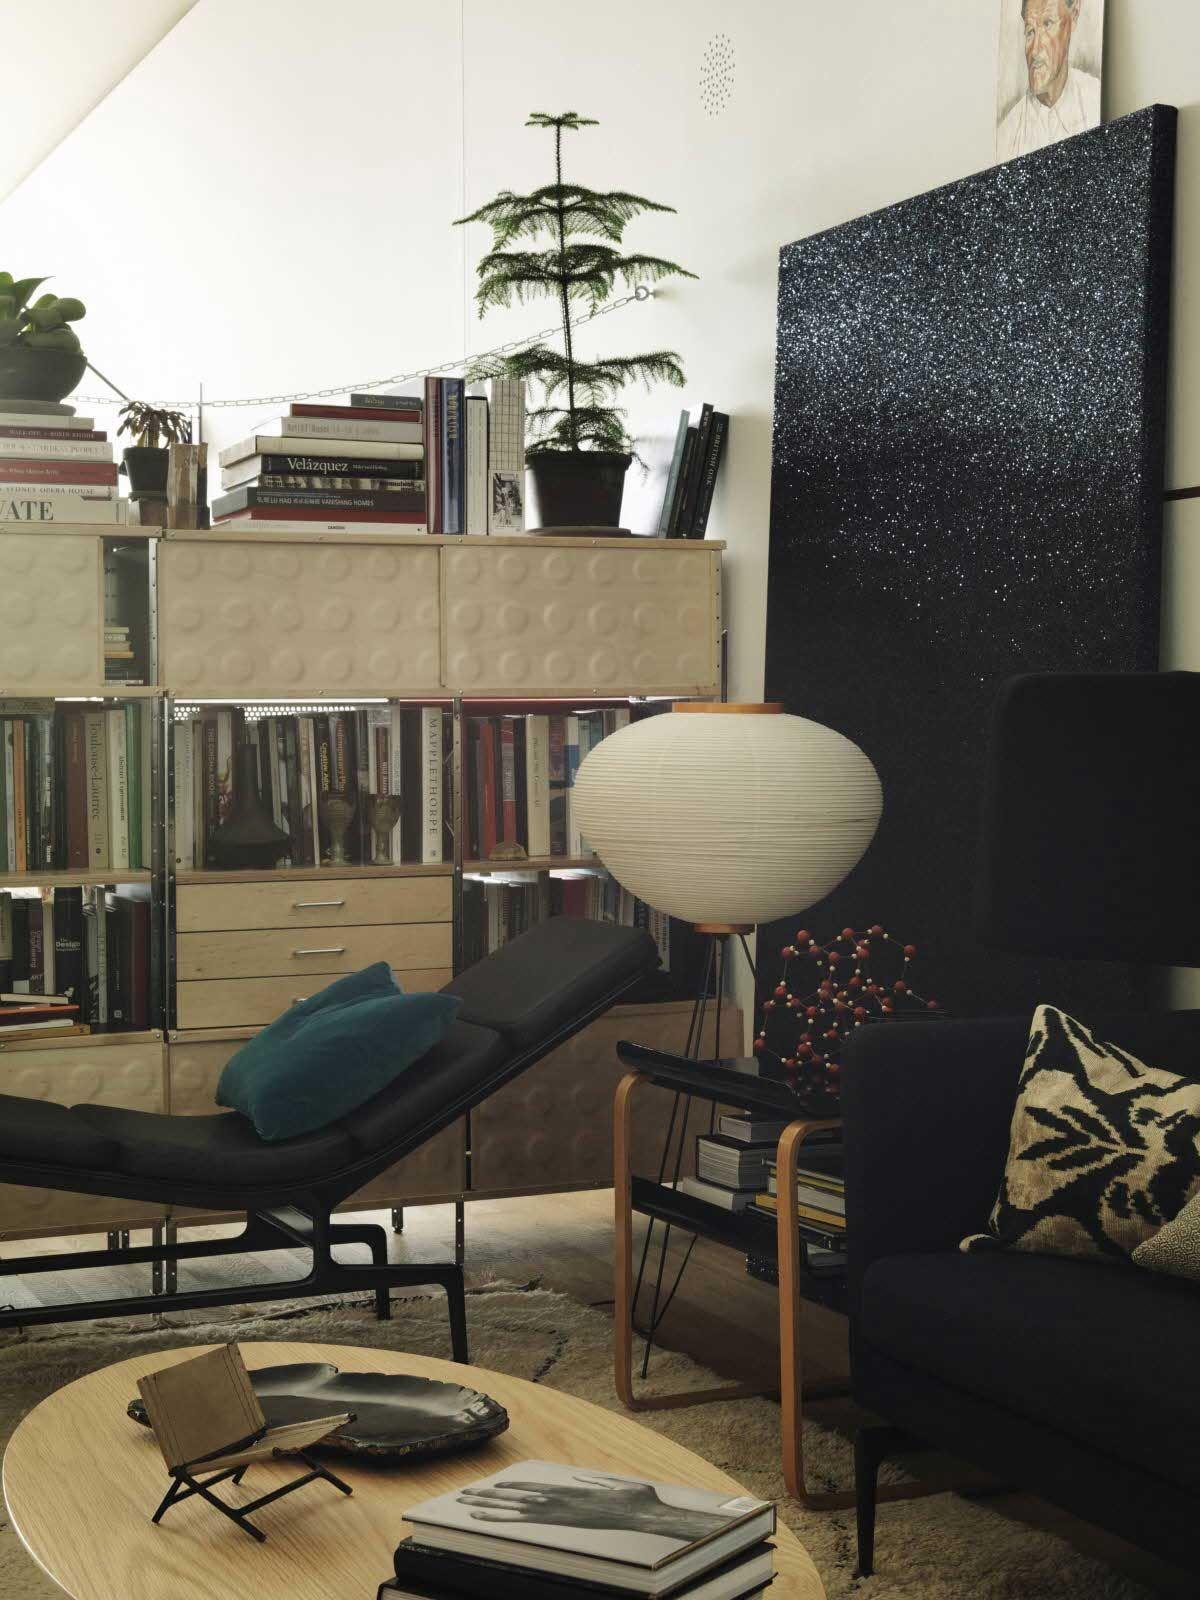 Vitra artek studio ilse super sweet installation at vitrahaus